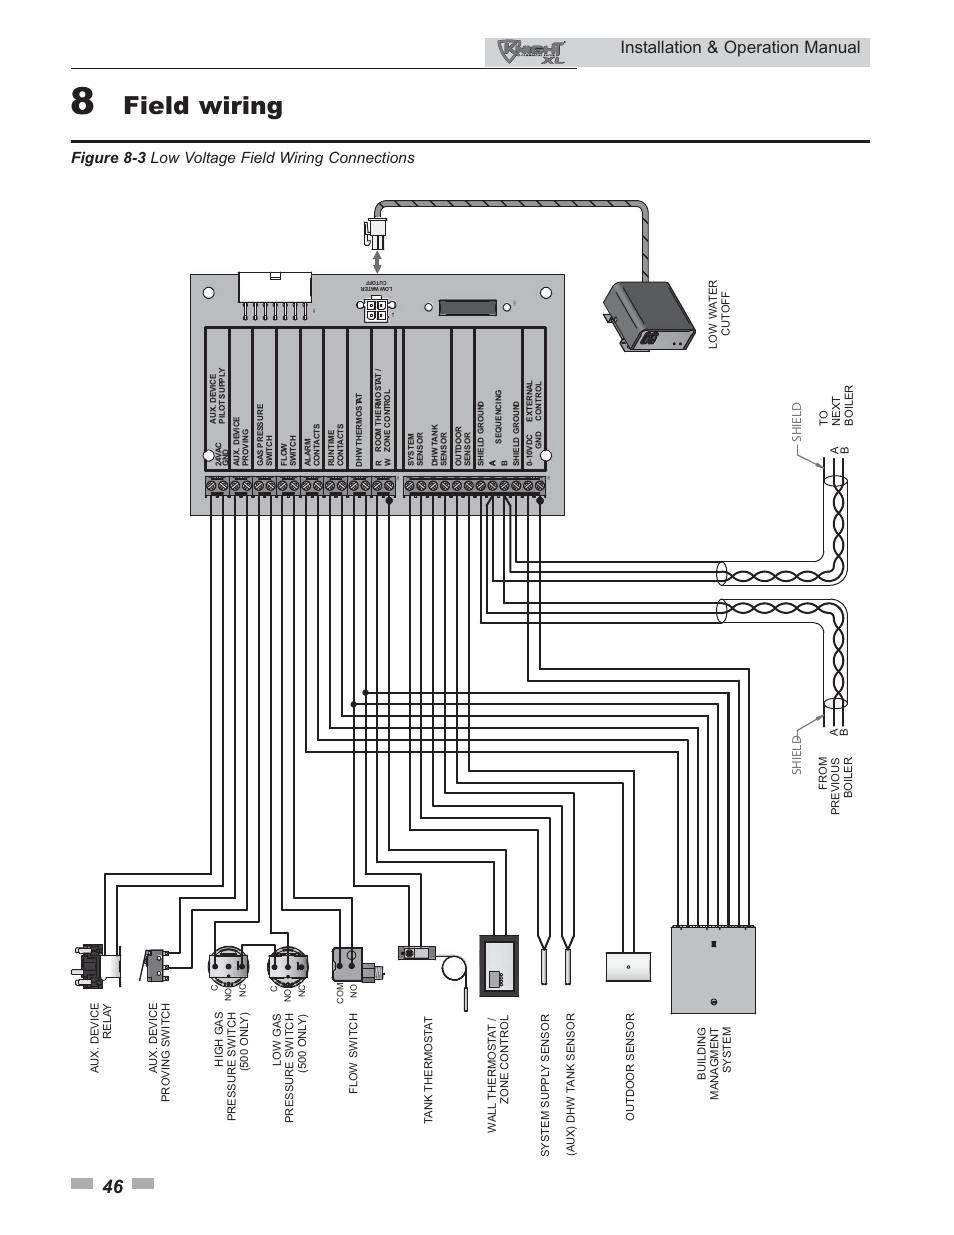 Field wiring, Installation & operation manual, Figure 8-3 ... on